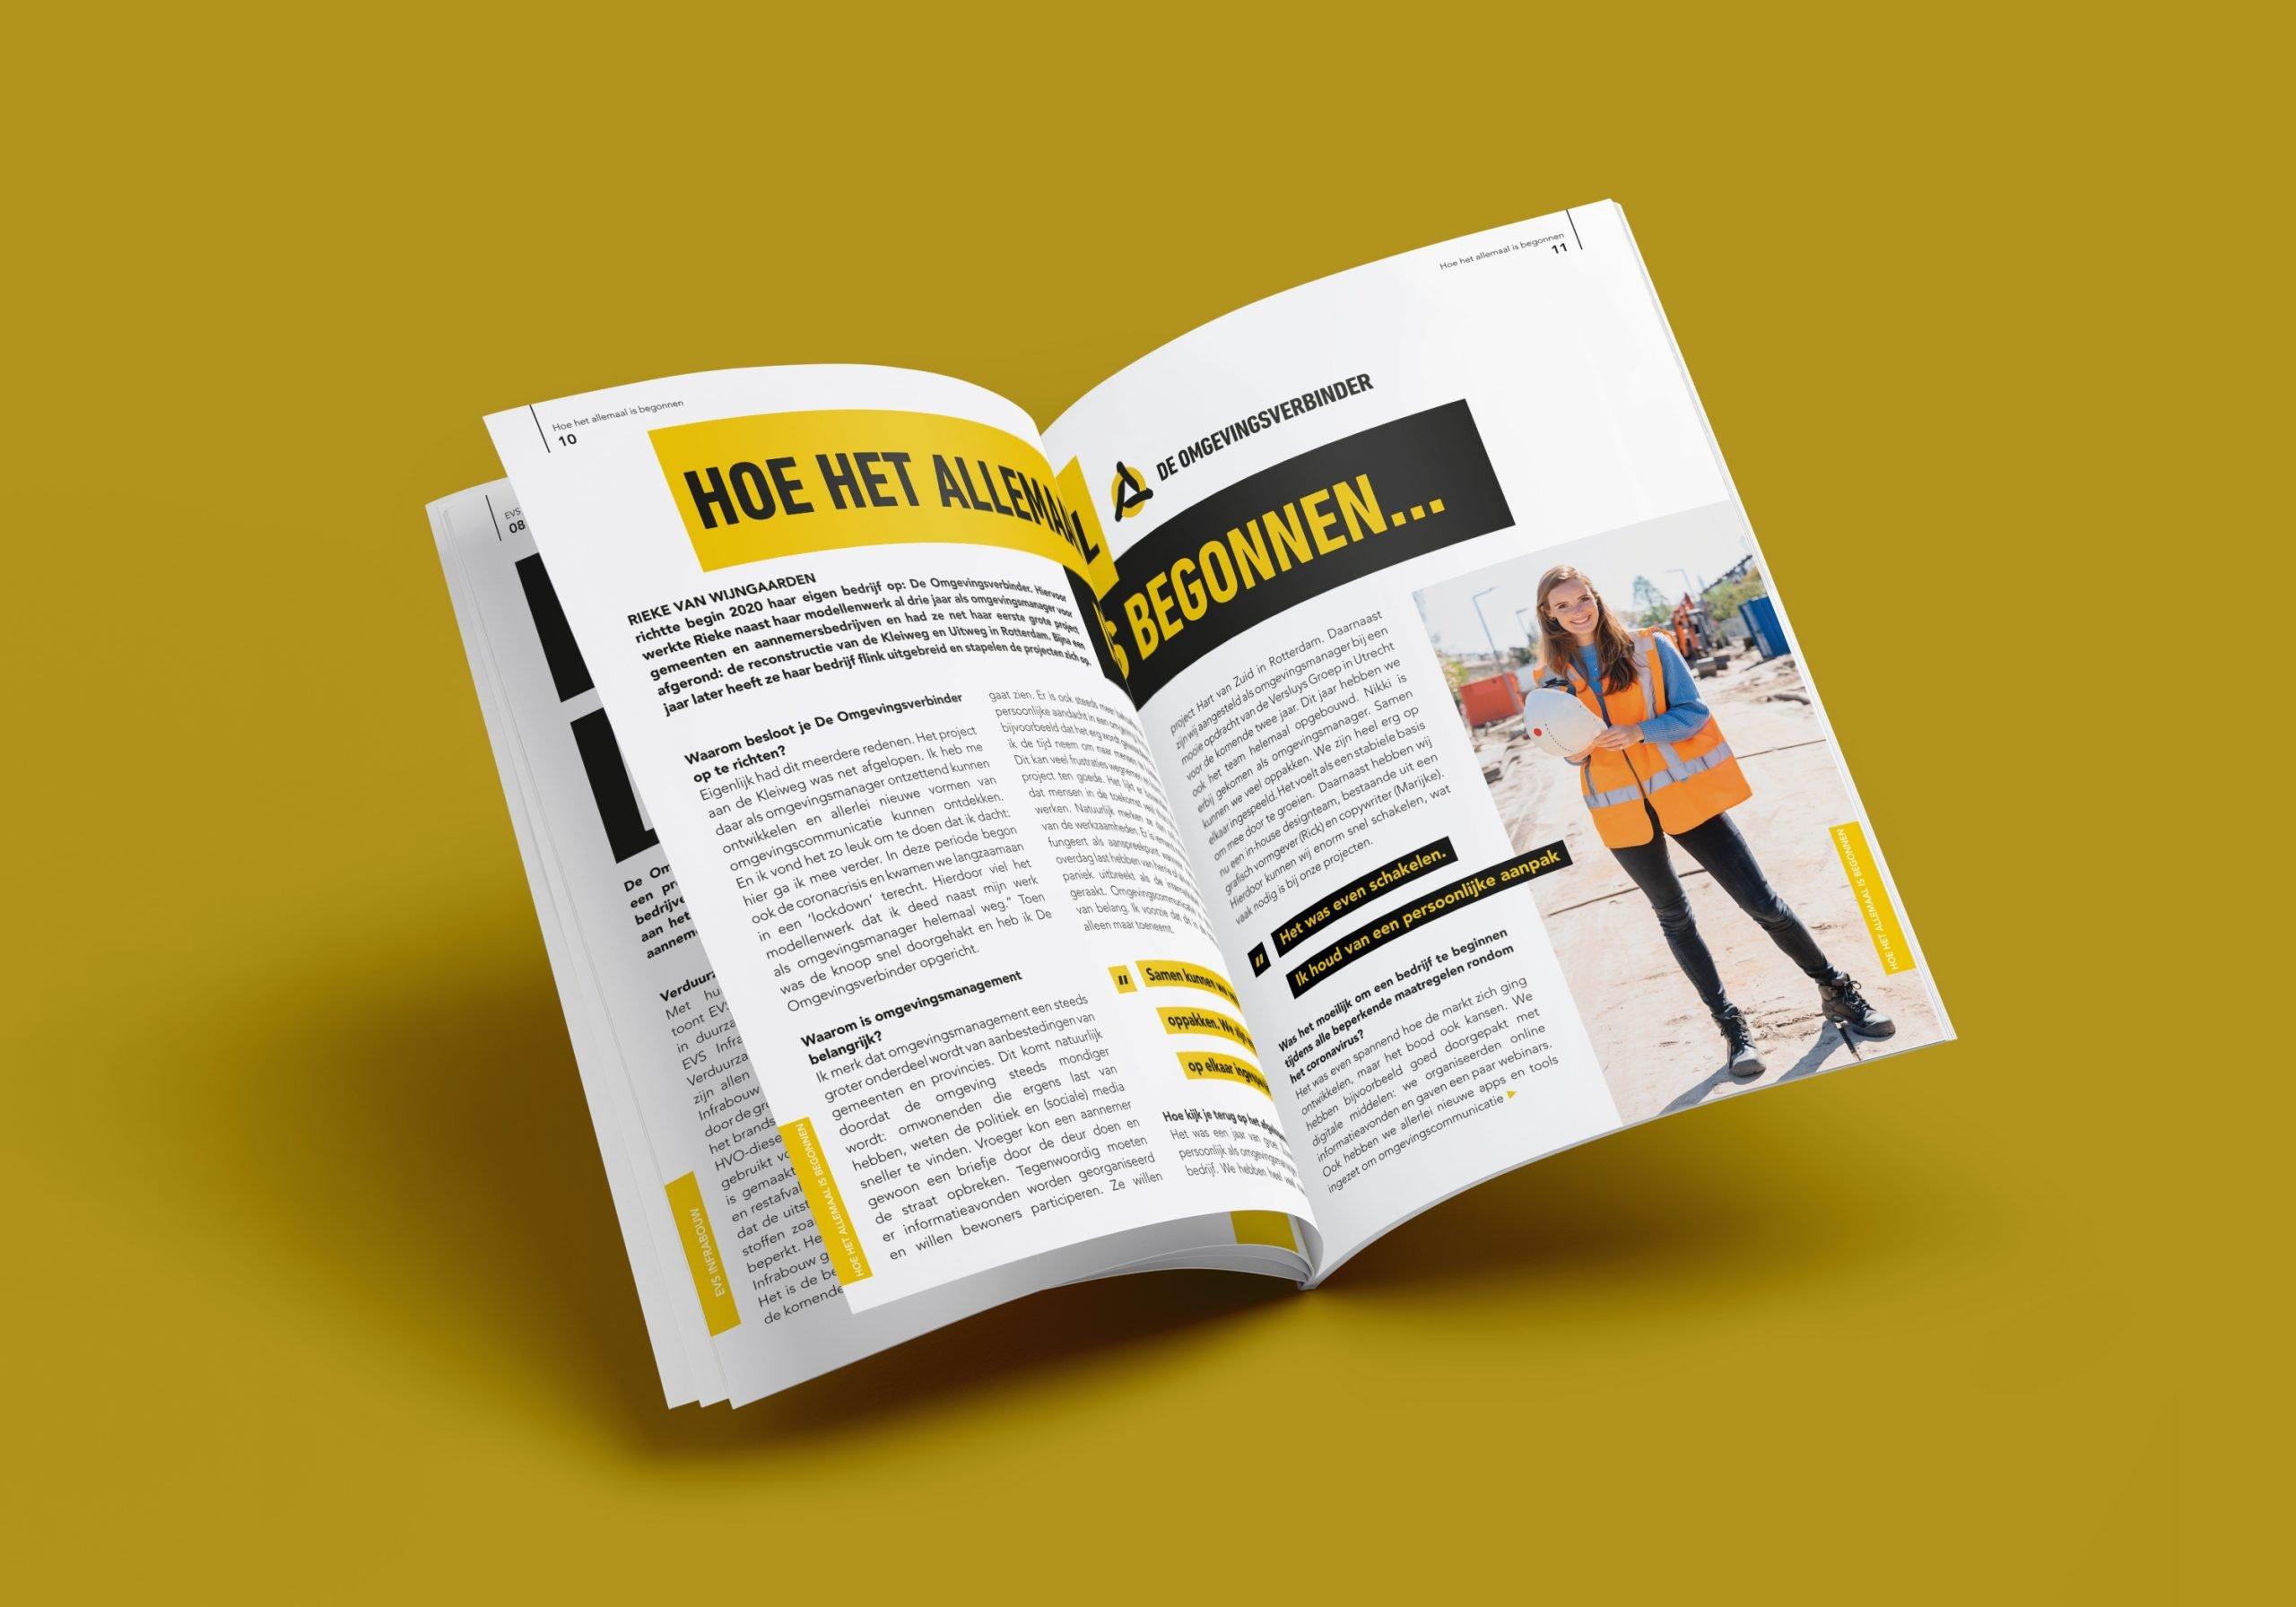 Magazine De Omgevingsverbinder